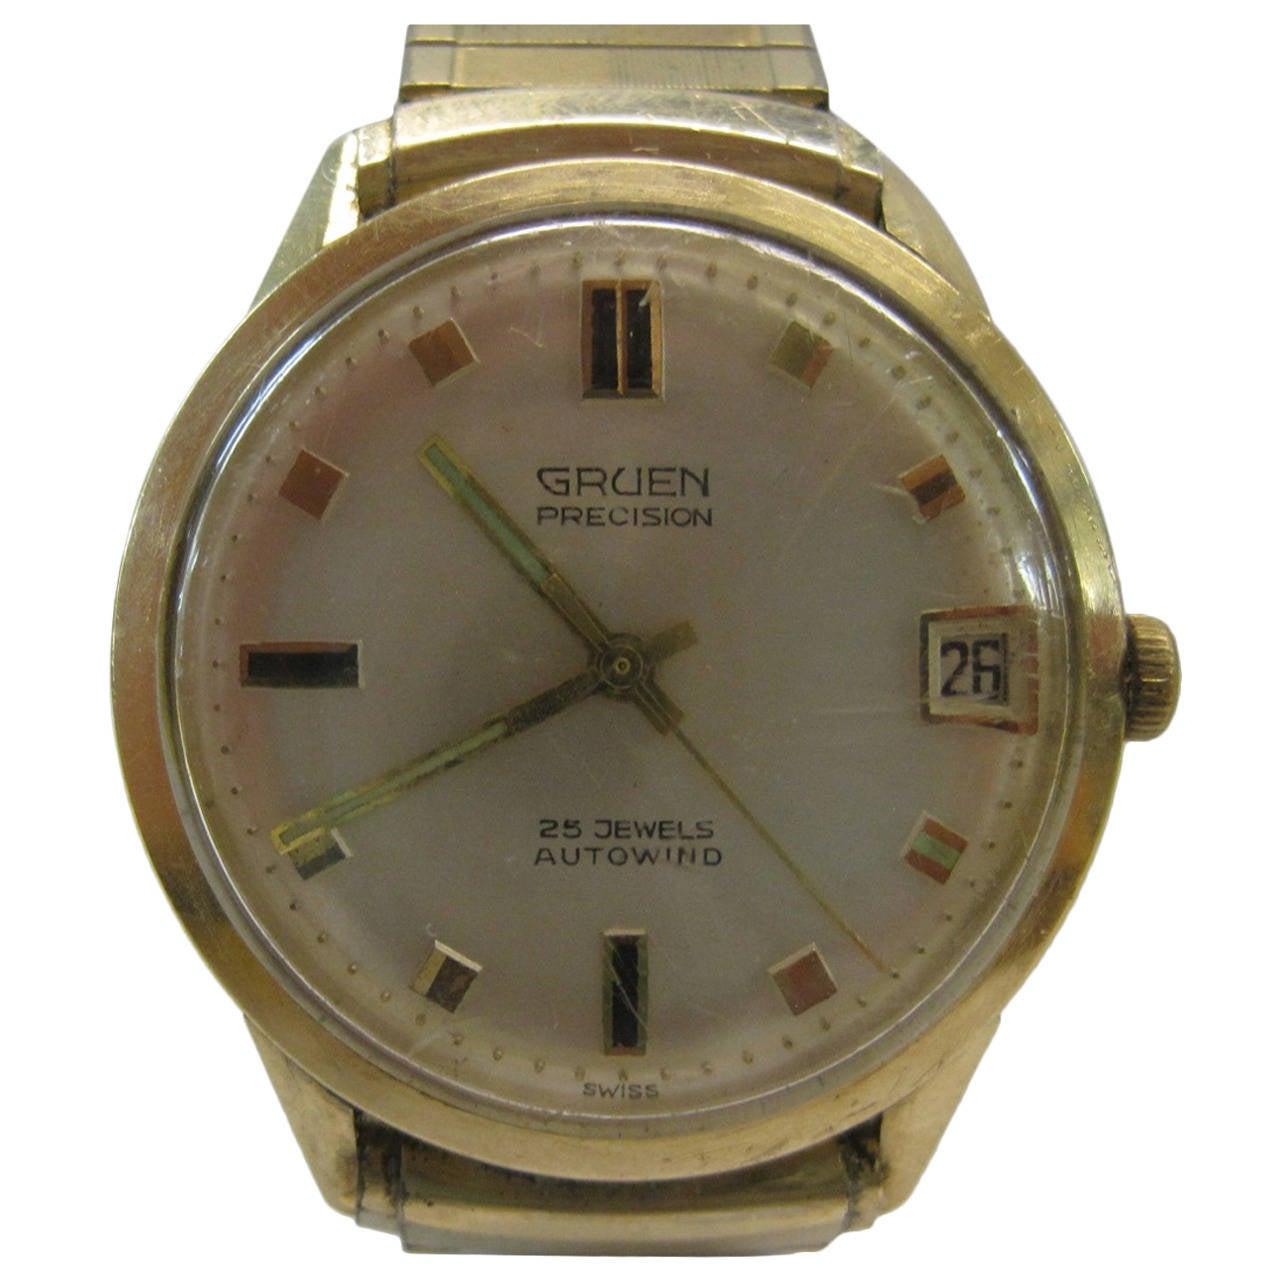 gruen precision watch 14 karat gold at 1stdibs. Black Bedroom Furniture Sets. Home Design Ideas